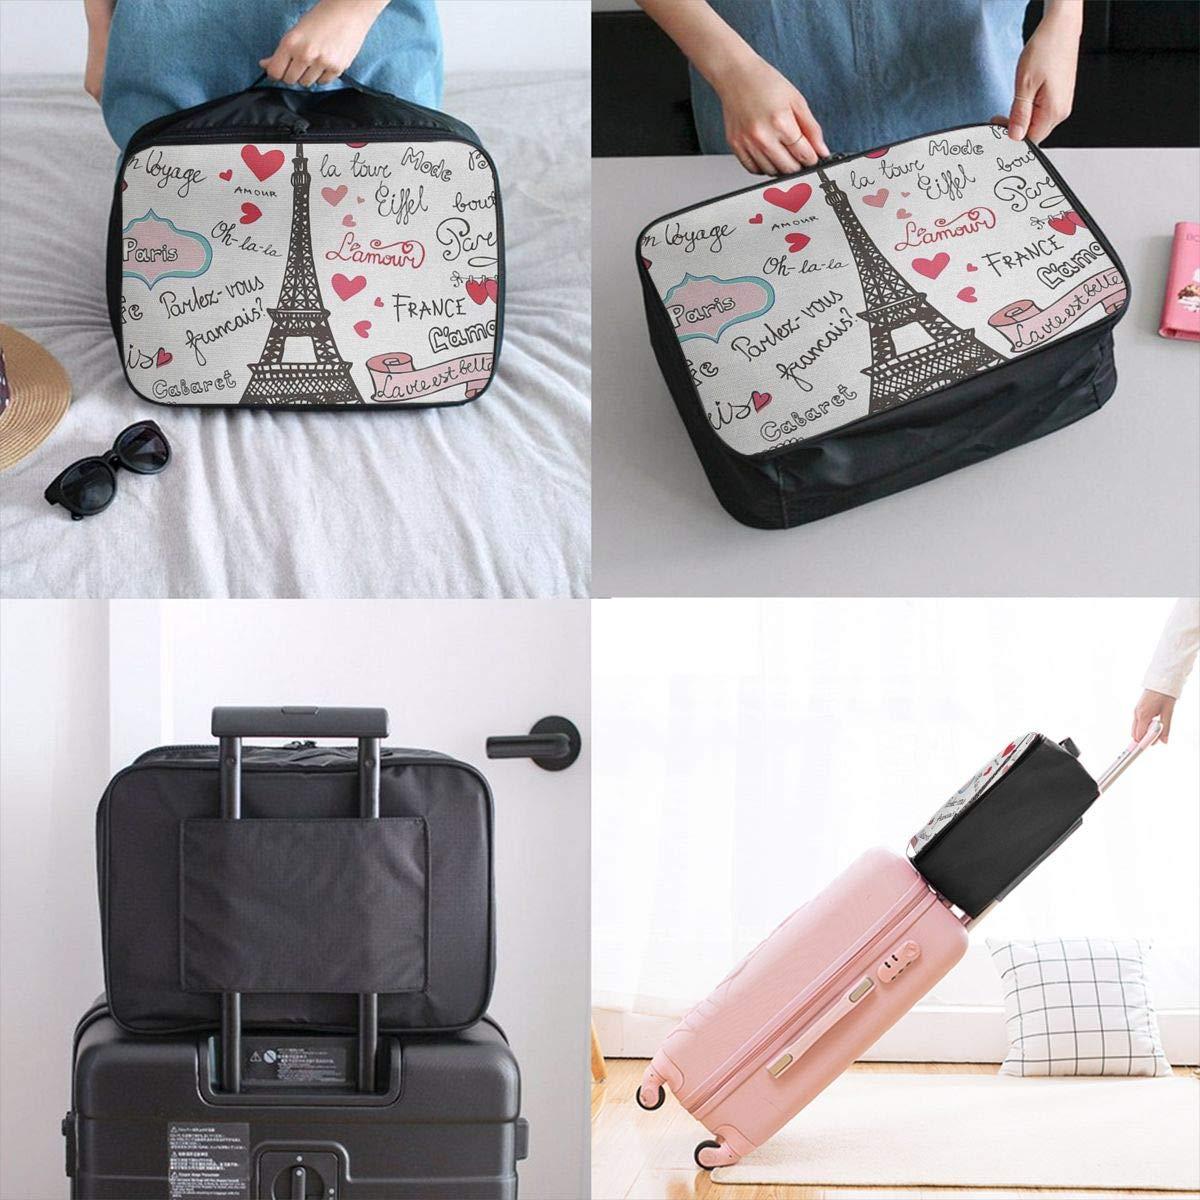 ADGAI Paris Symbols Lettering Heart Canvas Travel Weekender Bag,Fashion Custom Lightweight Large Capacity Portable Luggage Bag,Suitcase Trolley Bag